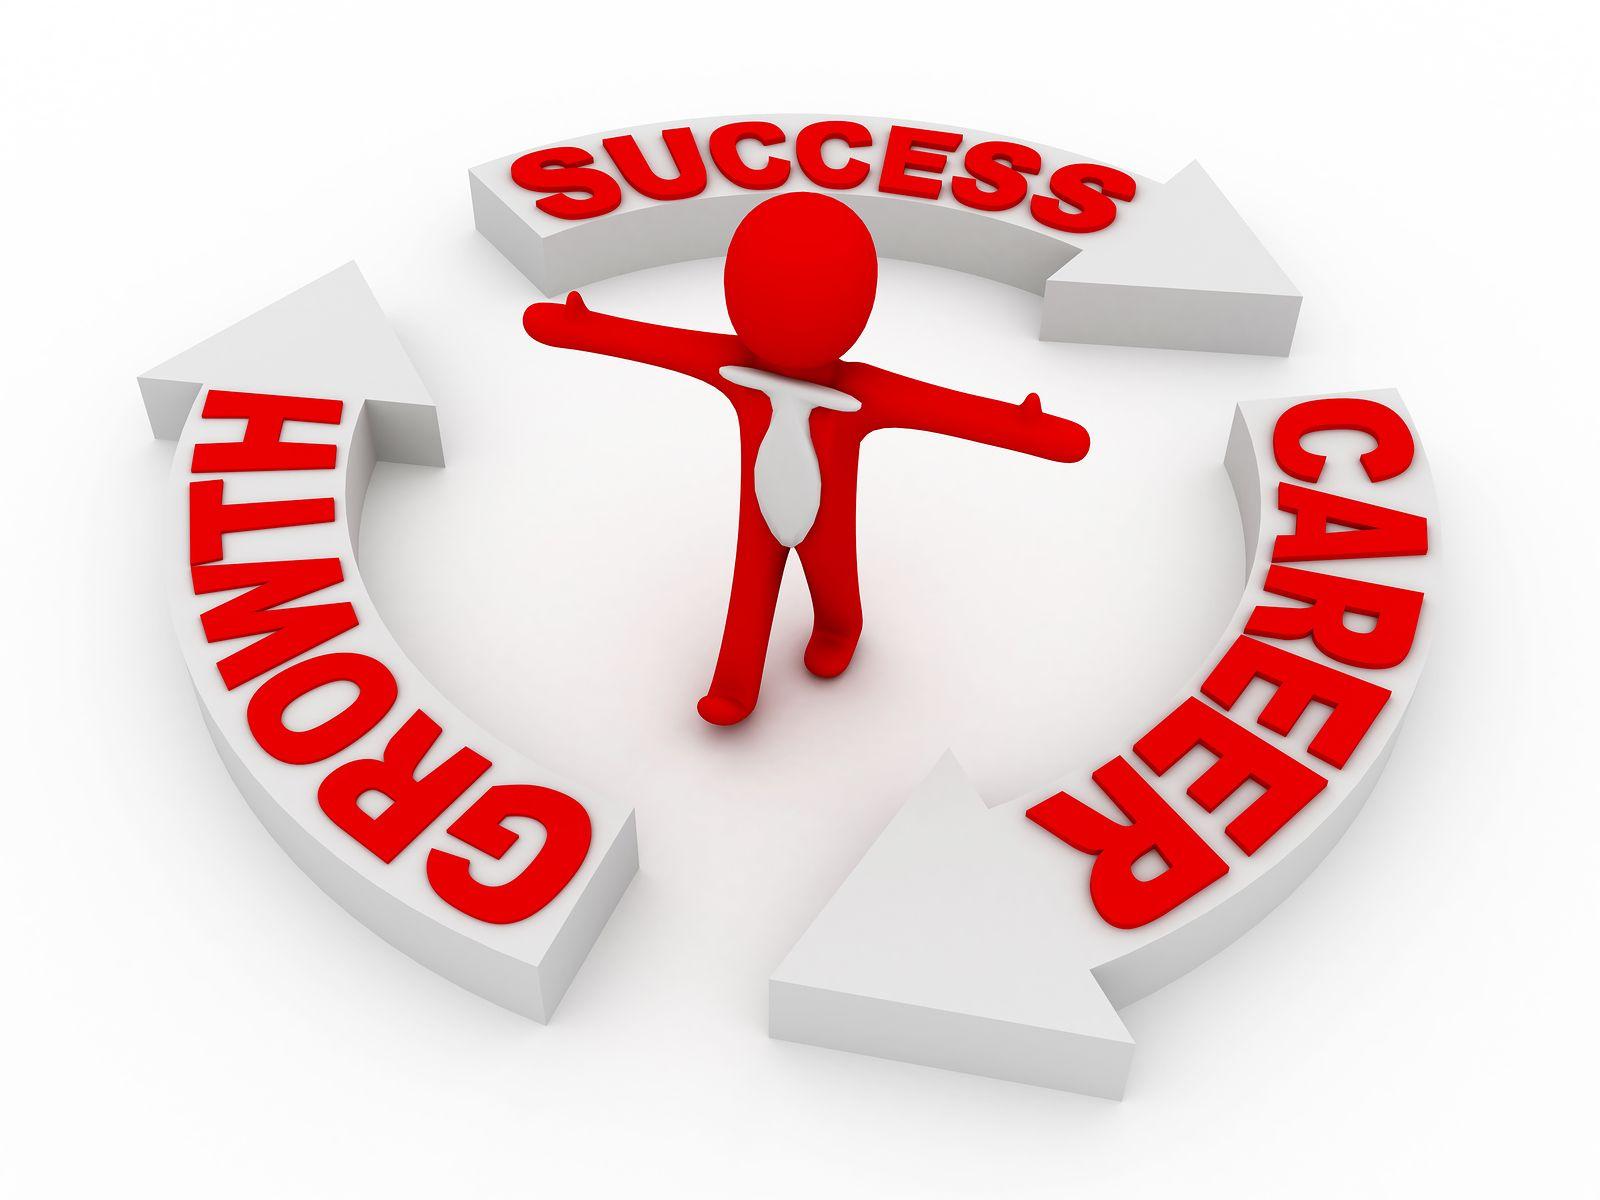 career success work balance in life successful career susses in your - Successful Career How To Be Successful In Career In Life